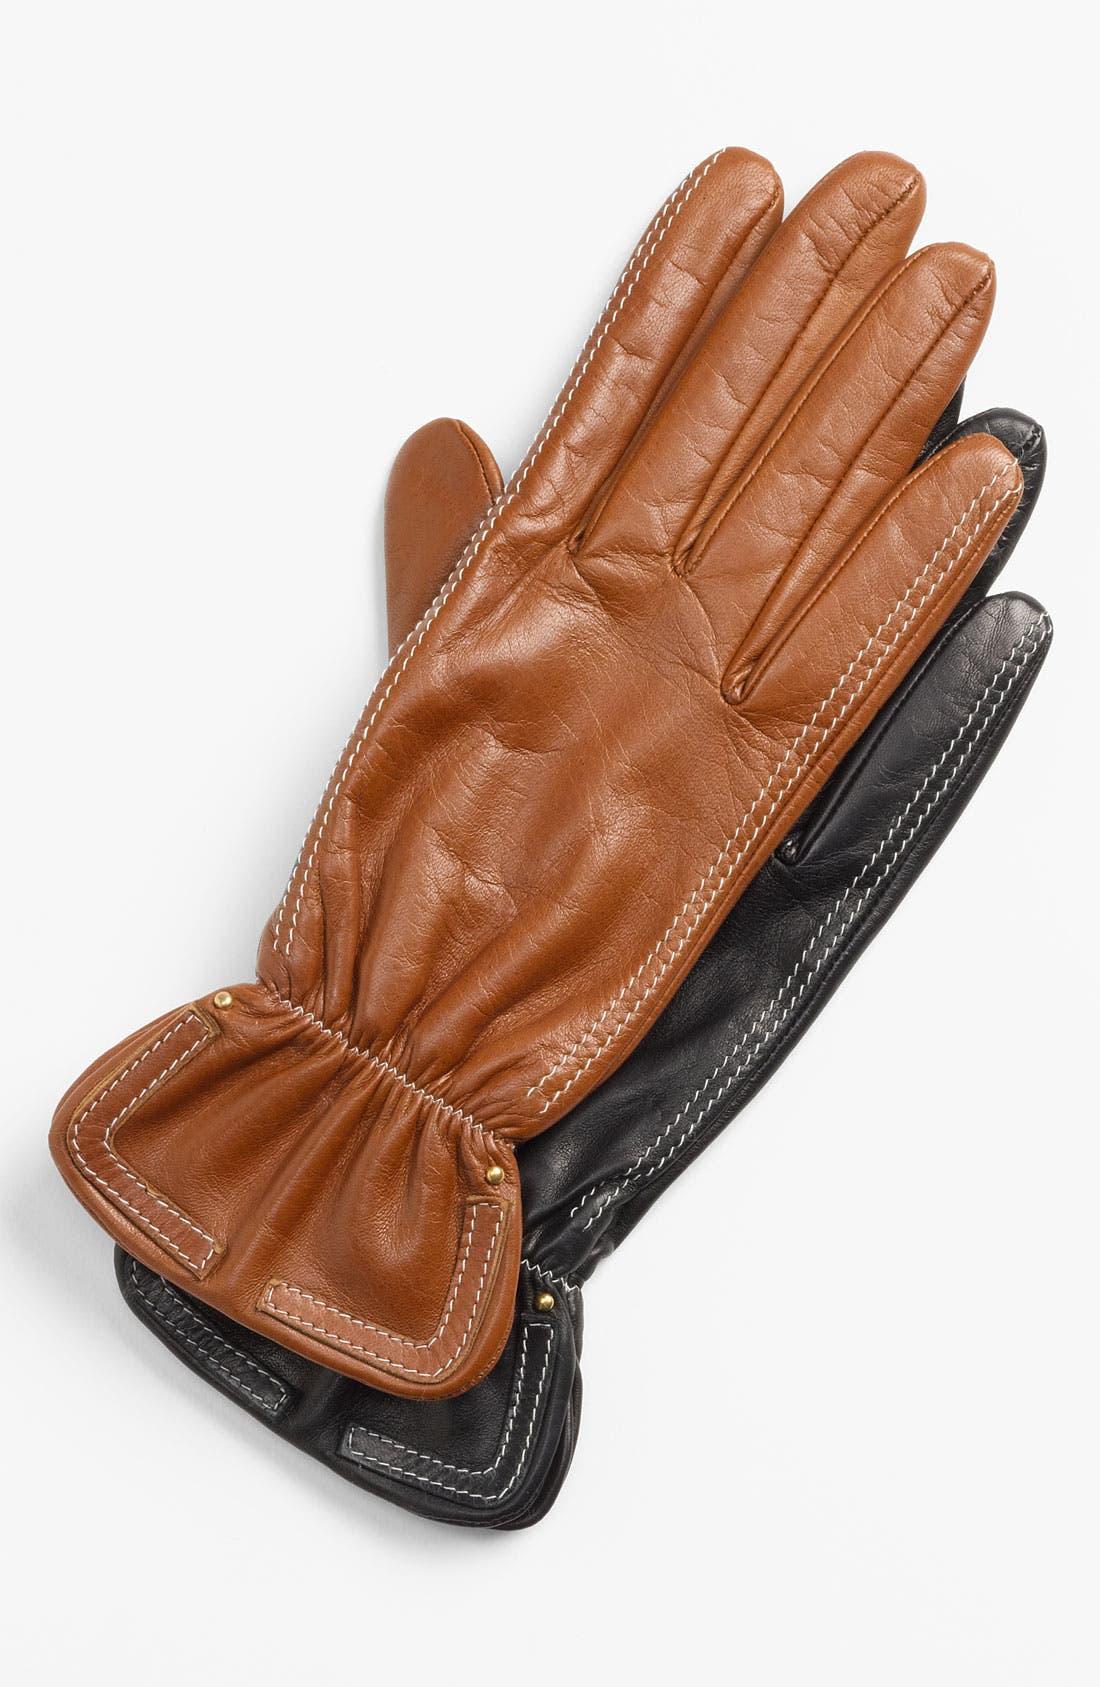 Alternate Image 1 Selected - Nordstrom Contrast Stitch Glacé Leather Gloves